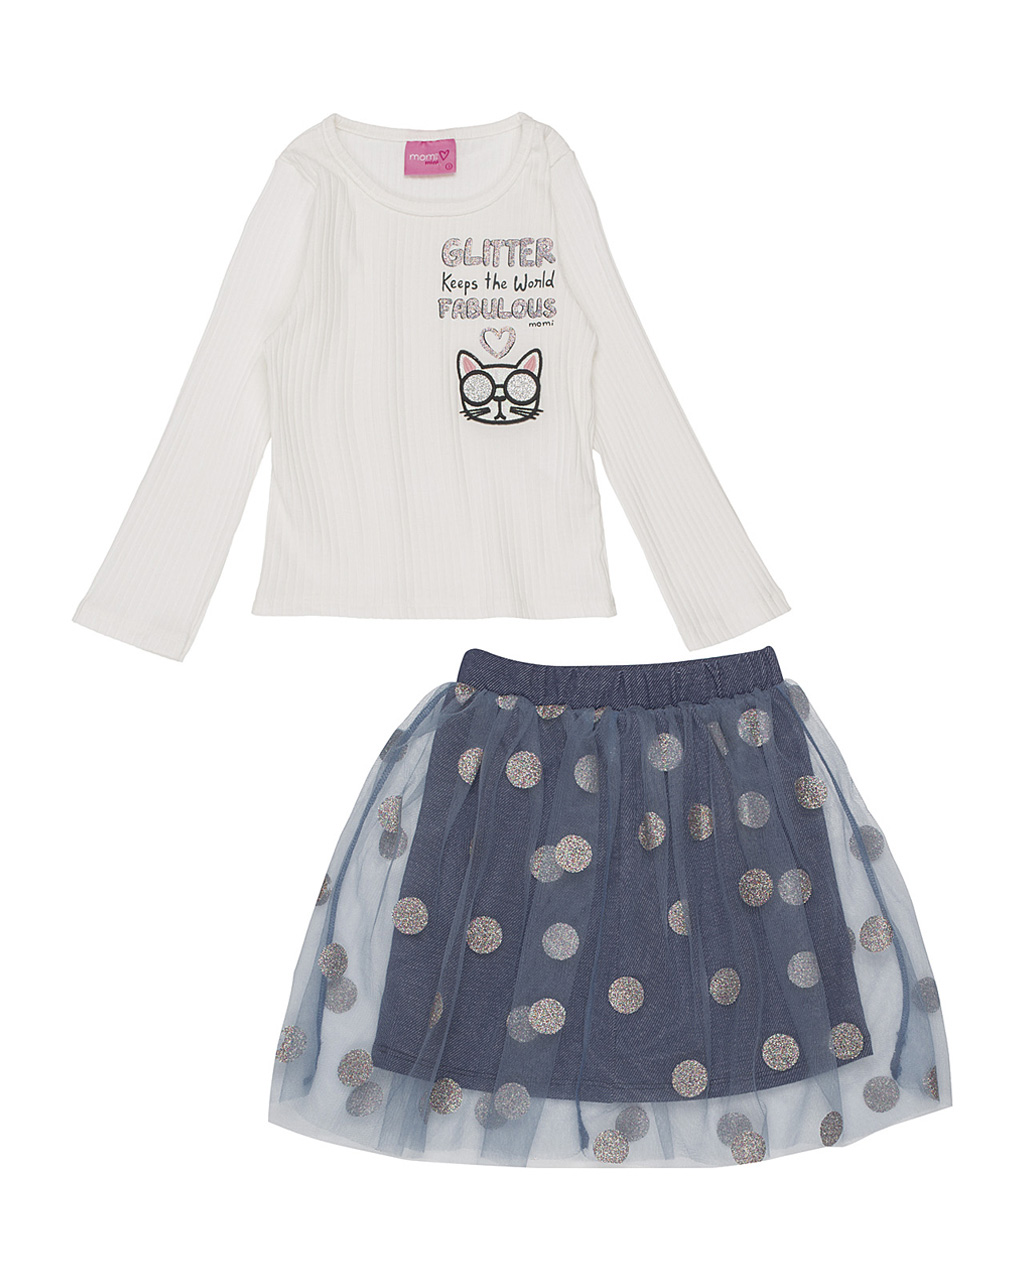 Conjunto Infantil Blusa Gatinha Fabulosa com Saia Tule Poá Brilhoso Momi